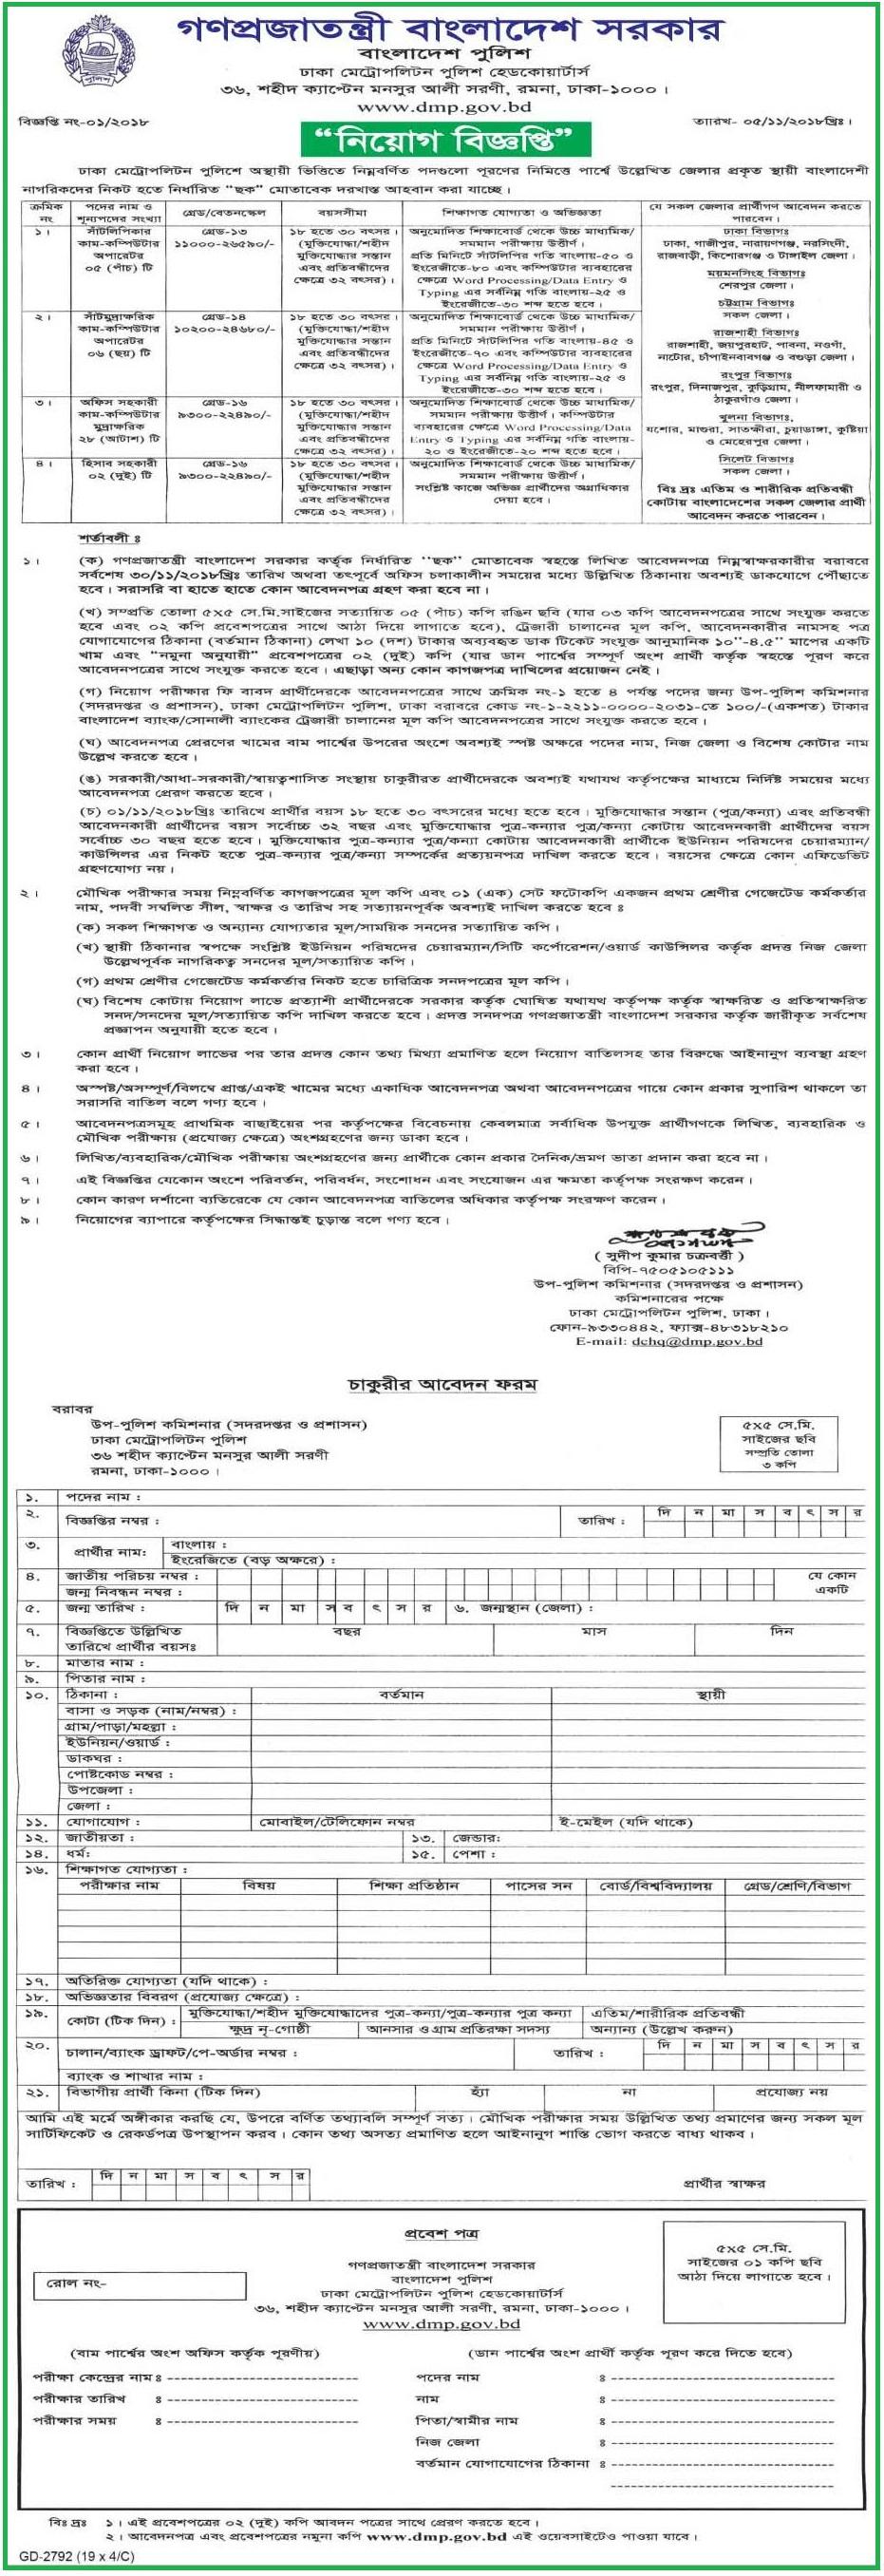 DMP Job Circular 2018 - dmp gov bd - See Dhaka Metropolitan Police Job Circular